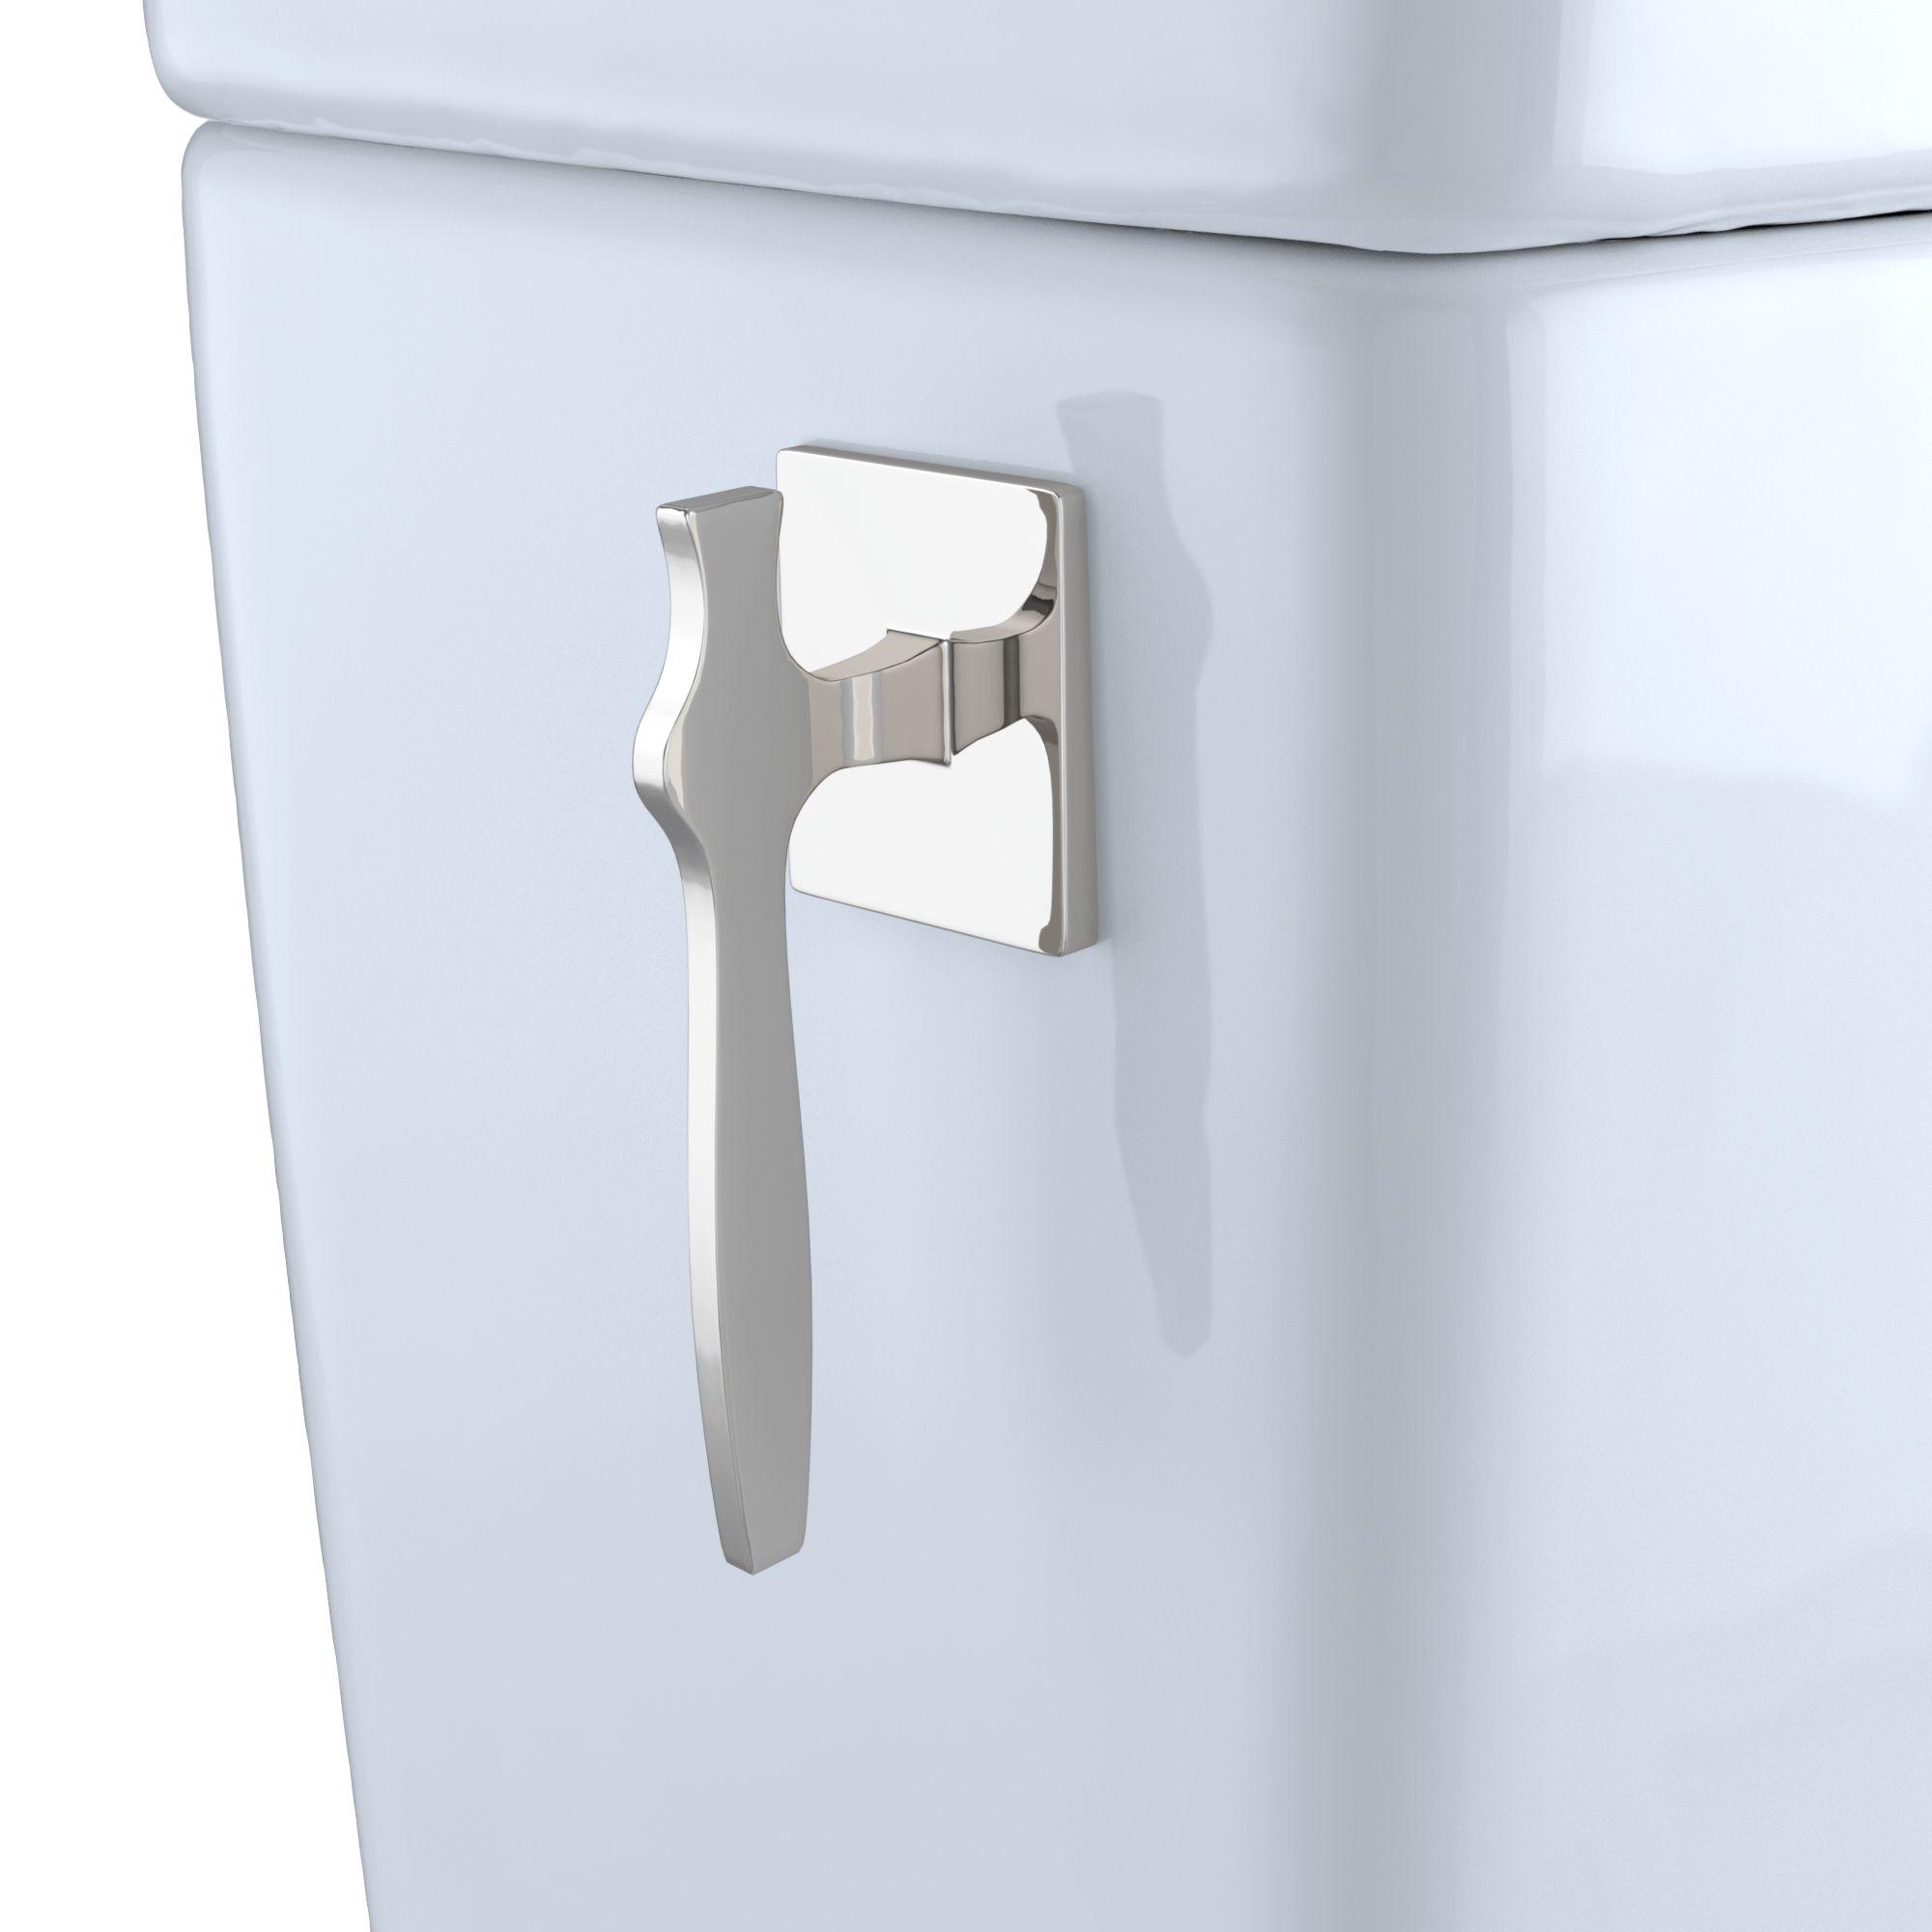 Aimes® One-Piece Toilet, 1.28GPF, Elongated Bowl - TotoUSA.com